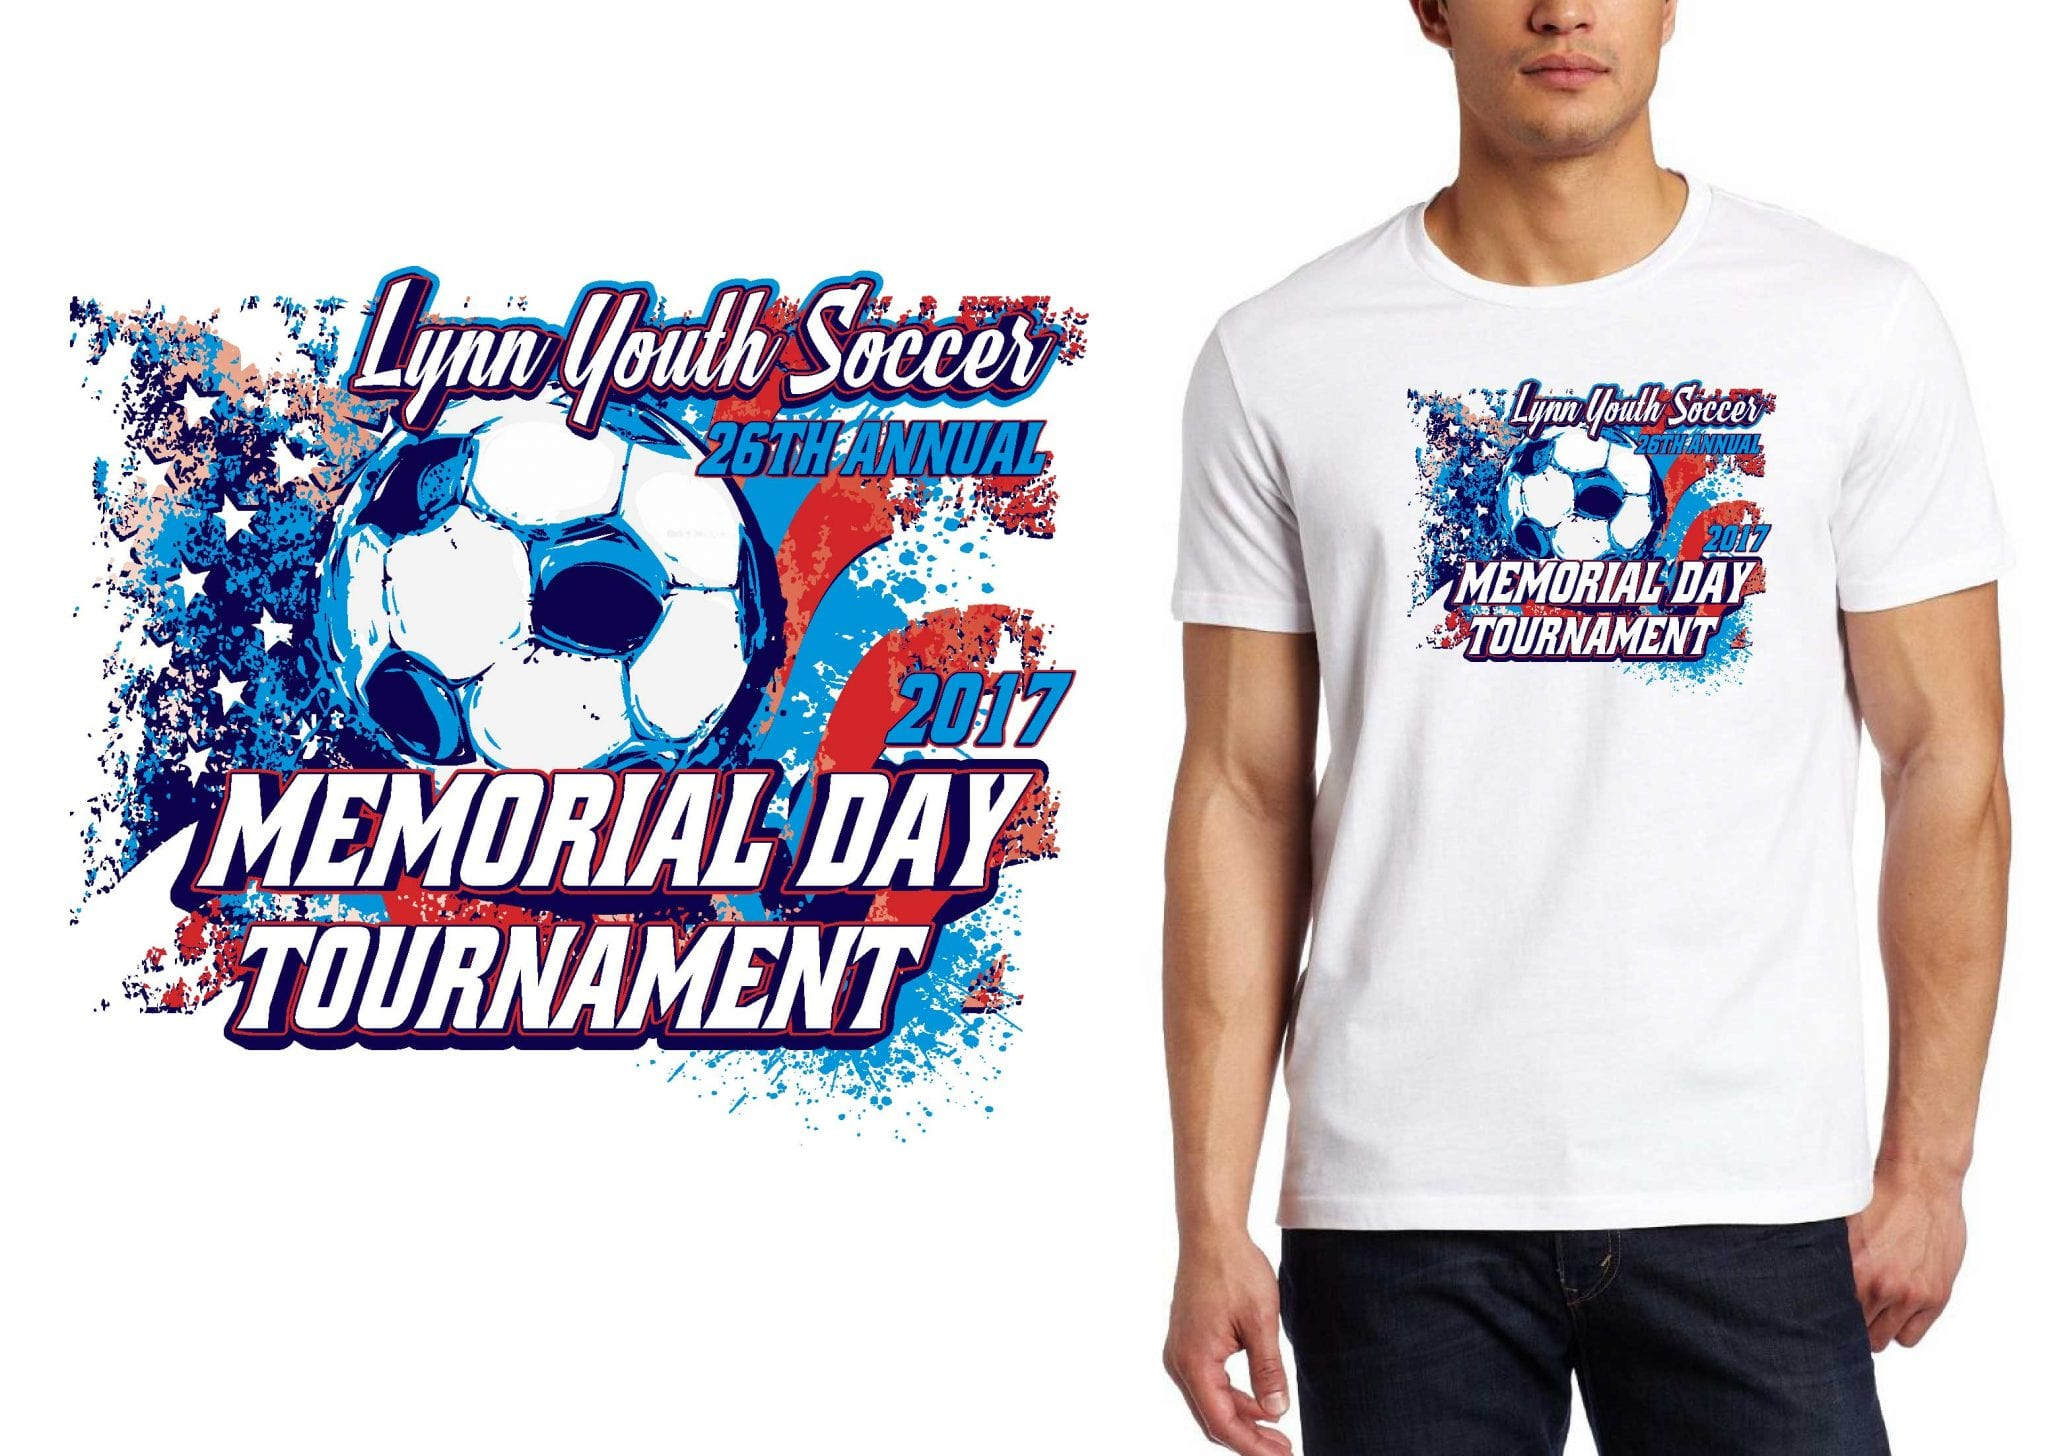 2017 26th Annual Lynn Youth Soccer Memorial Day Tournament vector logo design for t-shirt soccer urartstudio.com